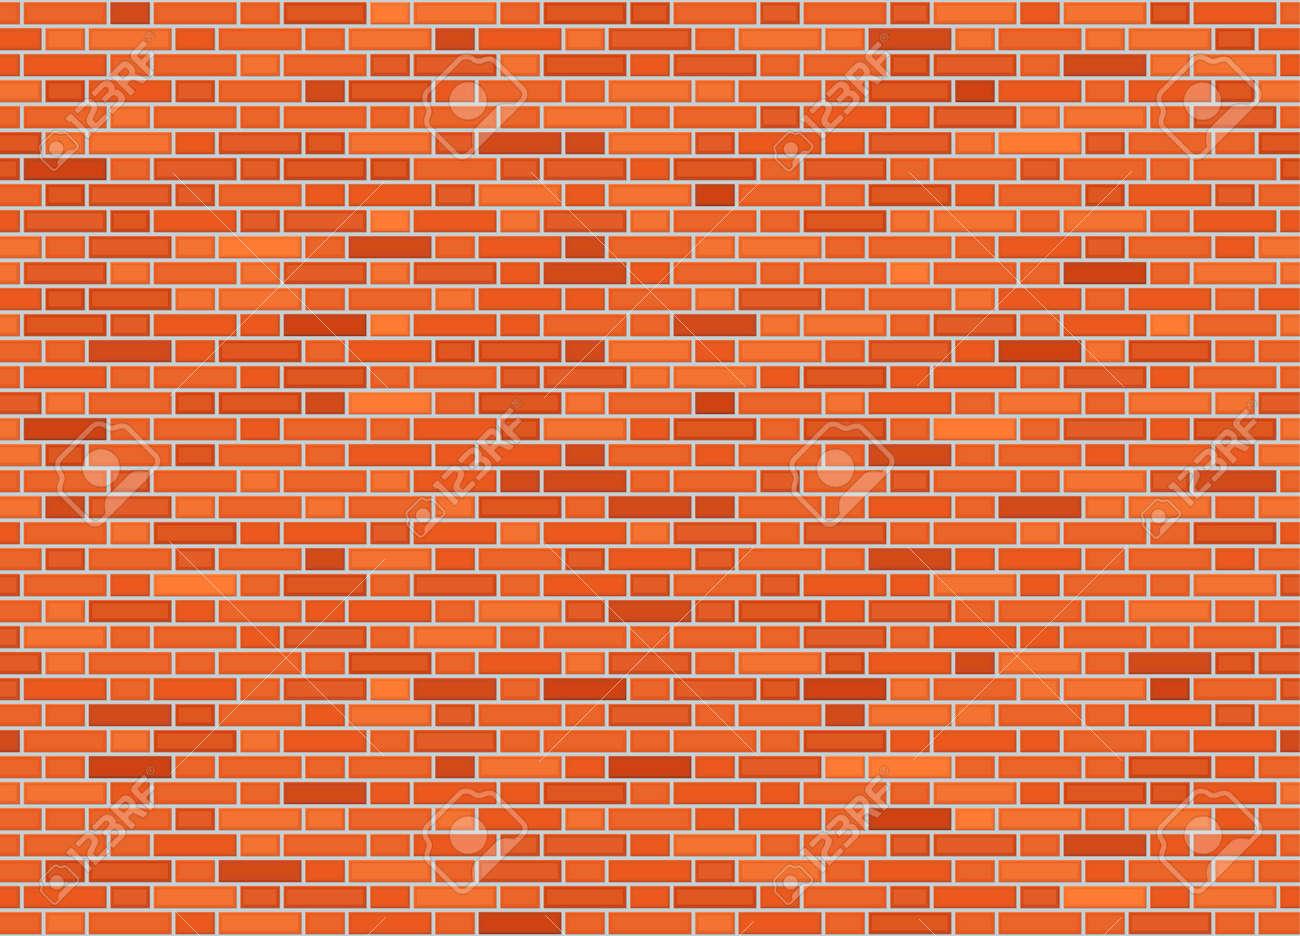 Vector seamless flemish bond brick wall texture - 98028440